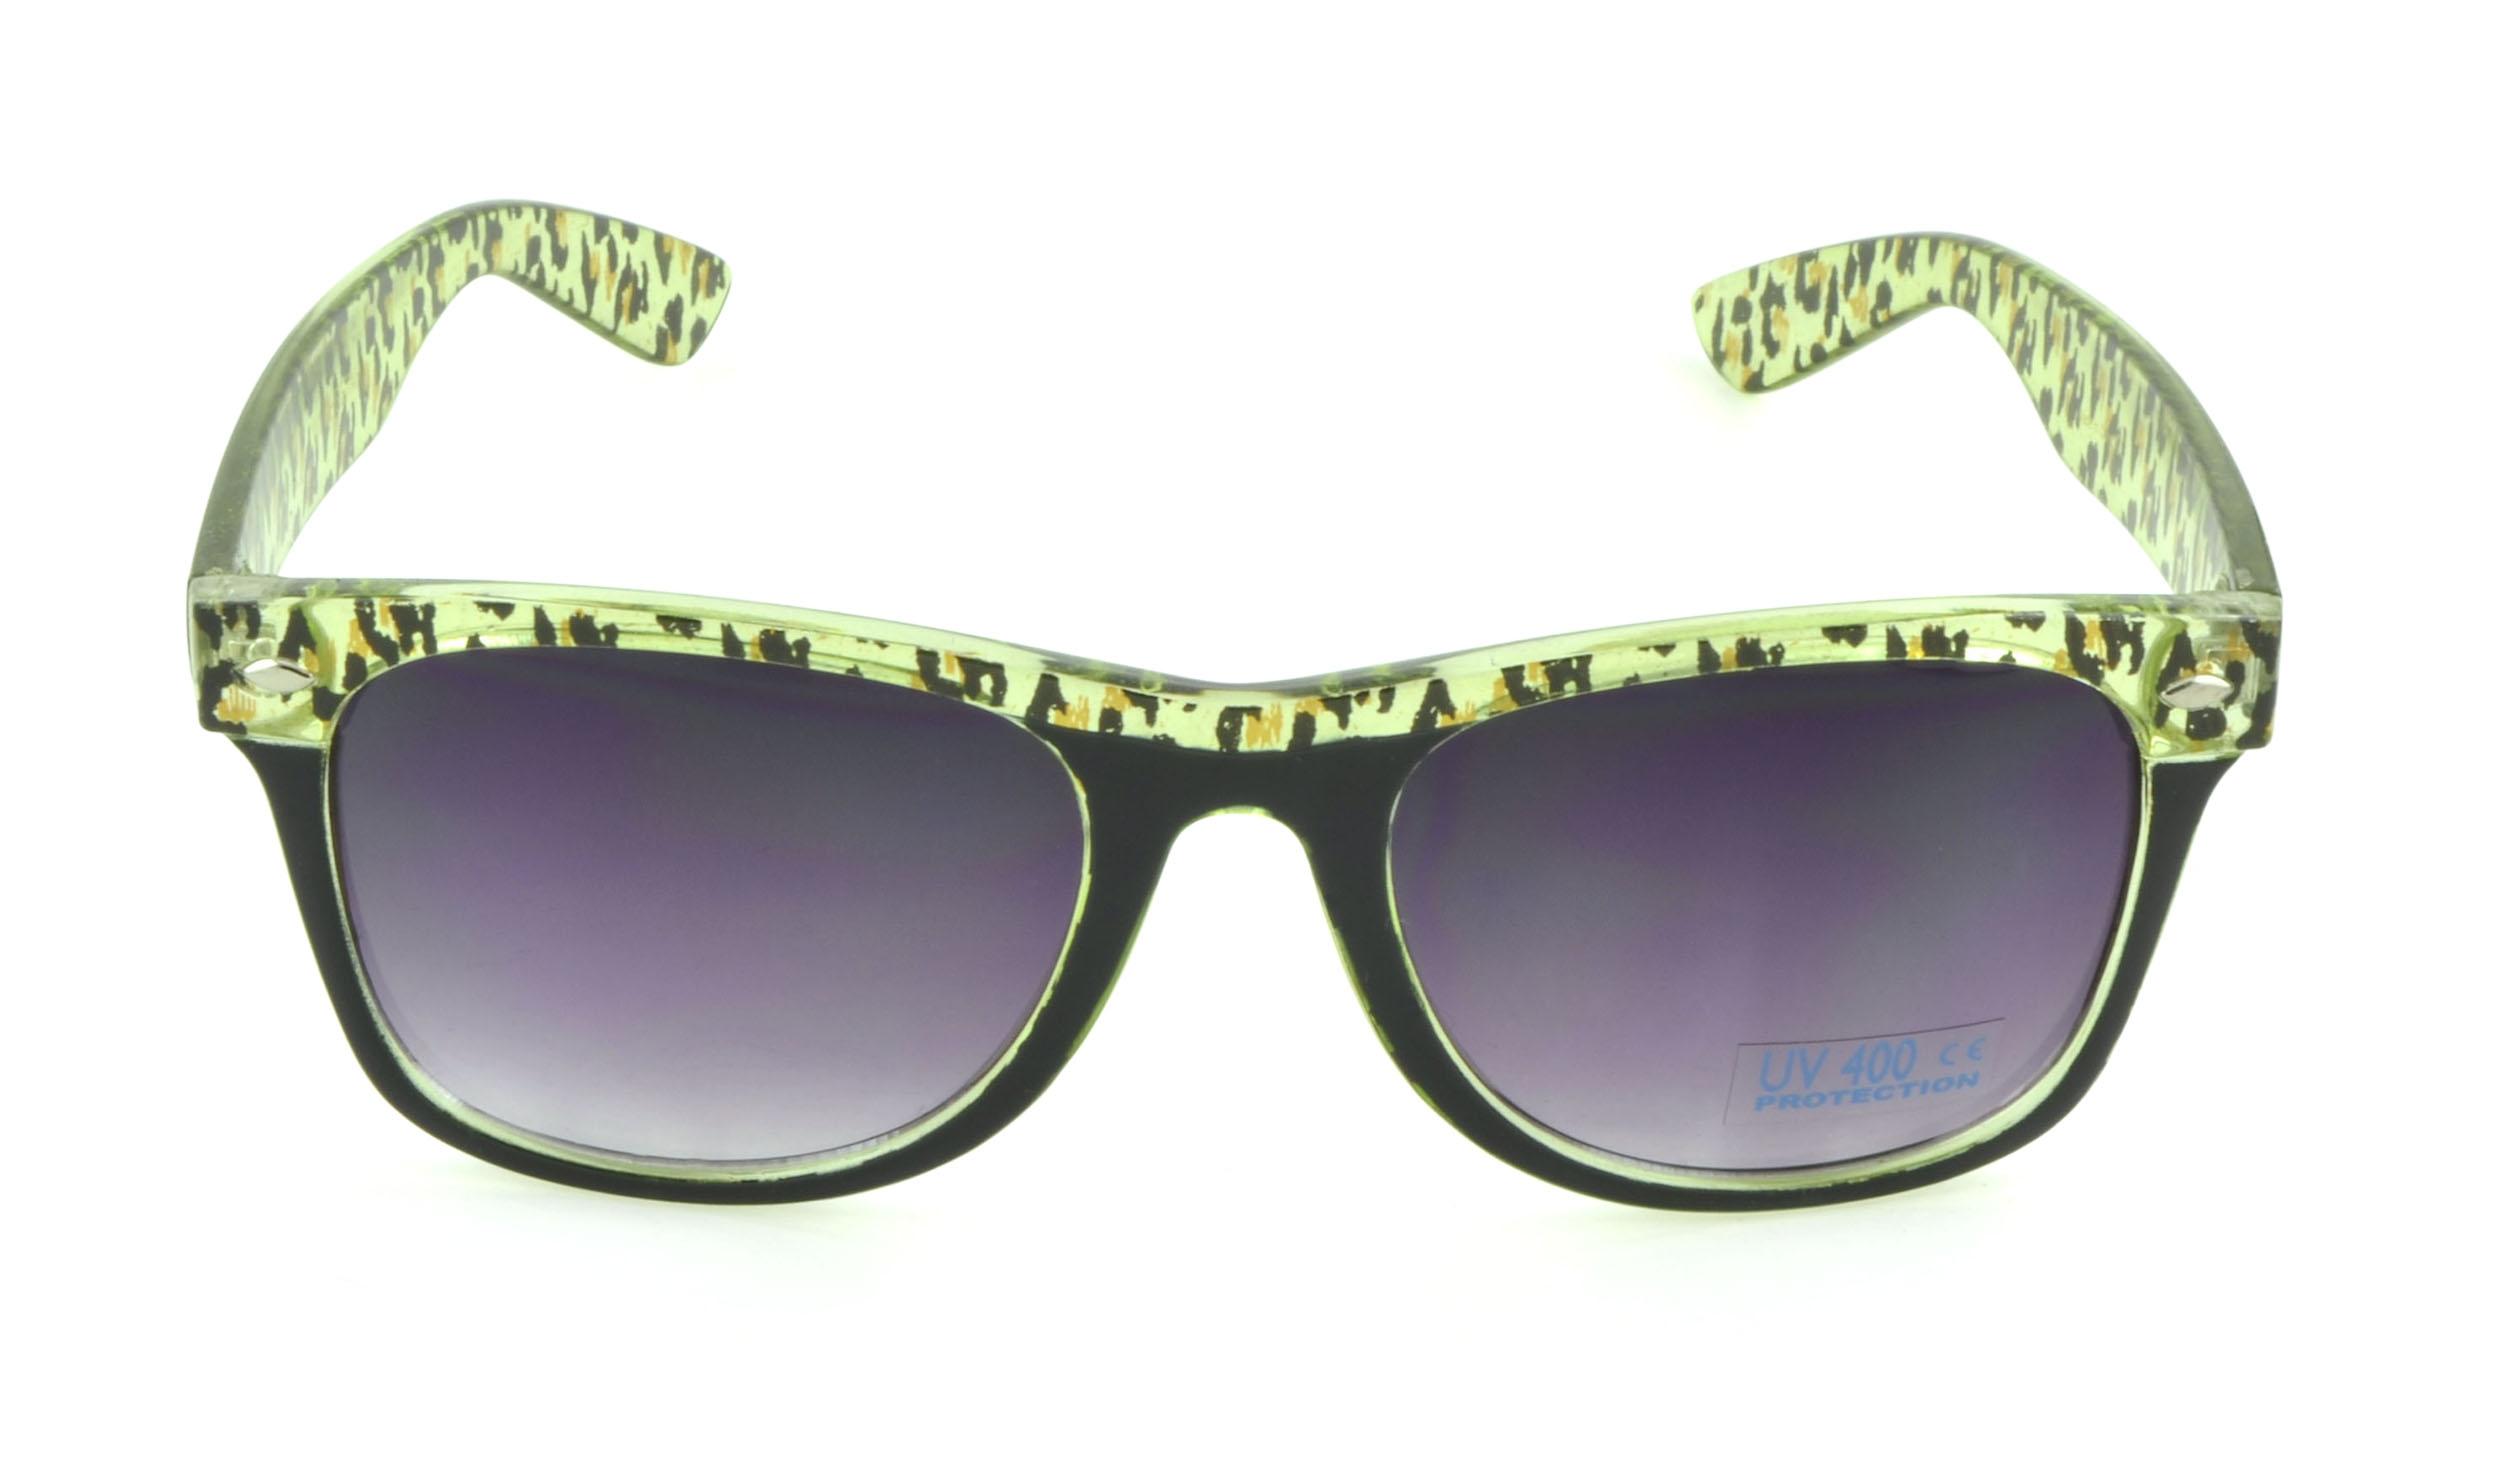 Belle Donne - Wayfarer Sunglasses Trendy Cheap Sunglasses - Womens Mens GIrls Boys Unisex Sunglasses - Green